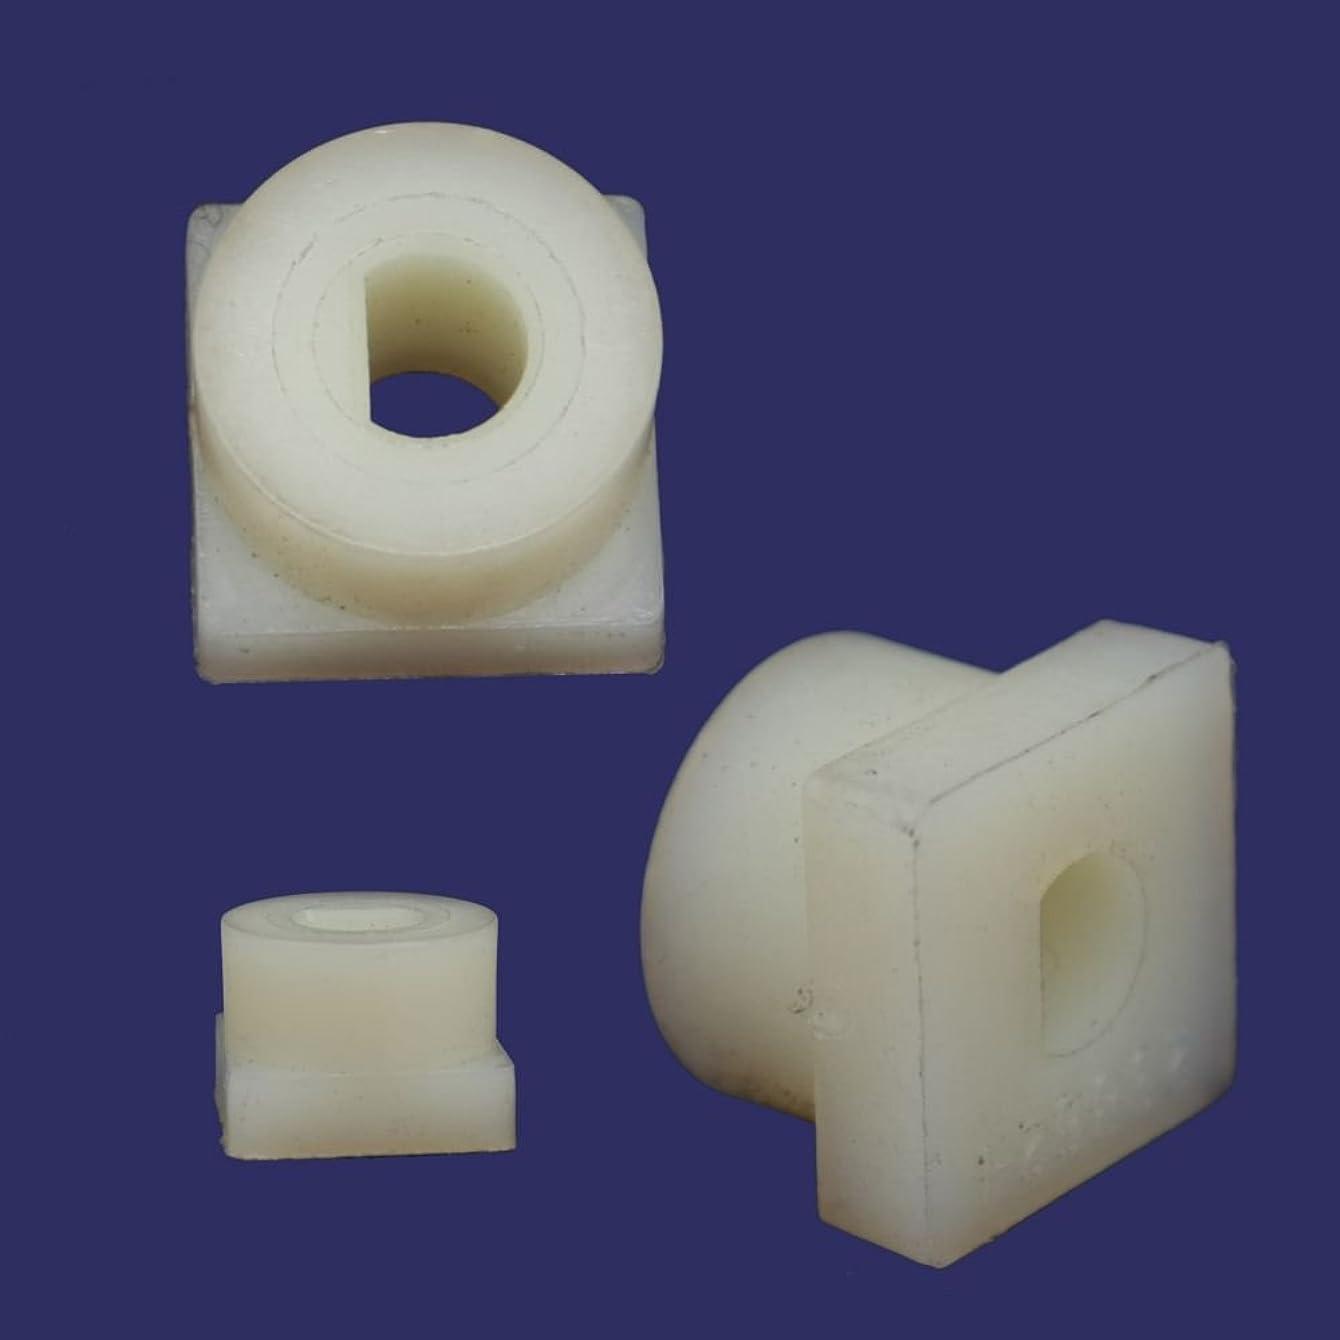 Kenmore 29862 Evaporative Cooler Roller Bearing Genuine Original Equipment Manufacturer (OEM) Part White